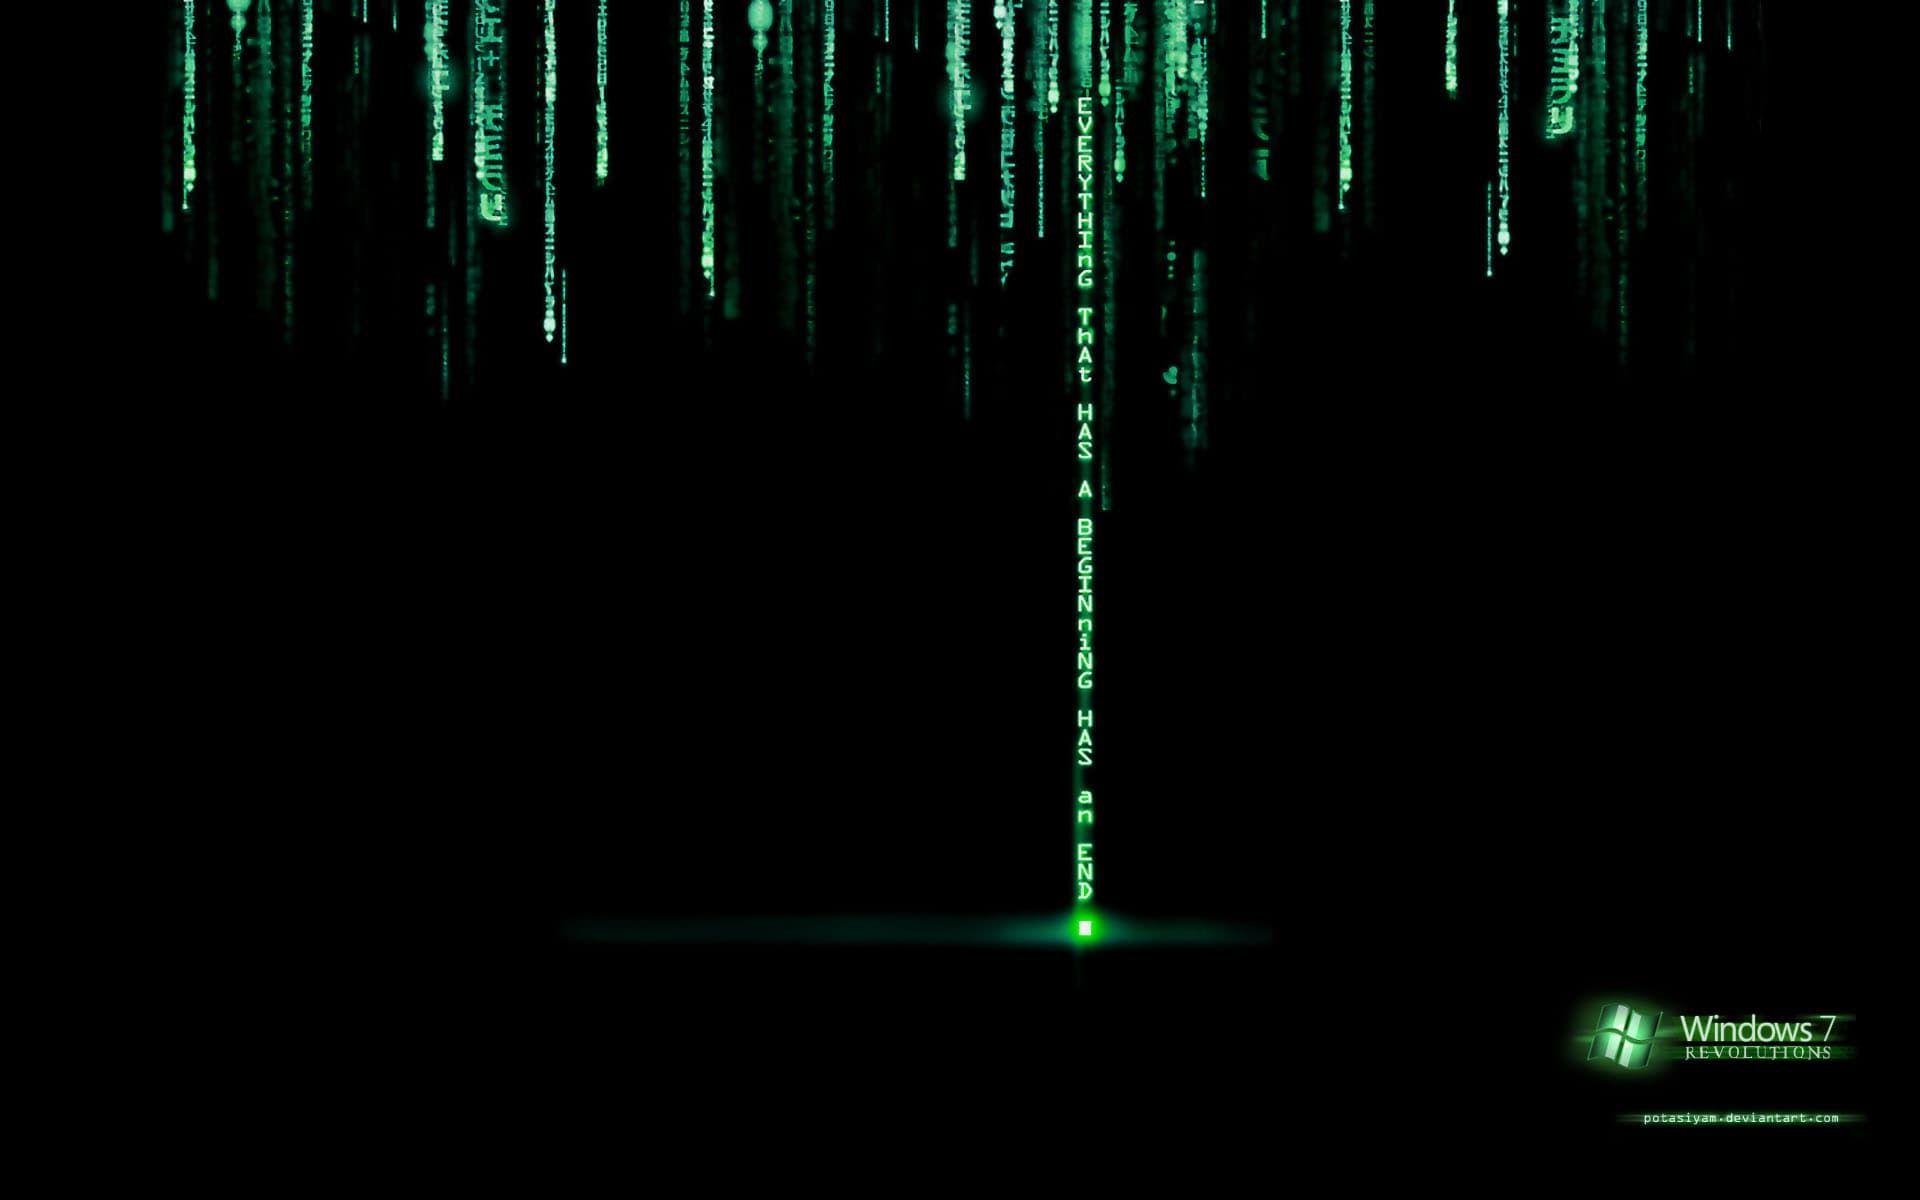 Matrix Black Windows Black Matrix Windows